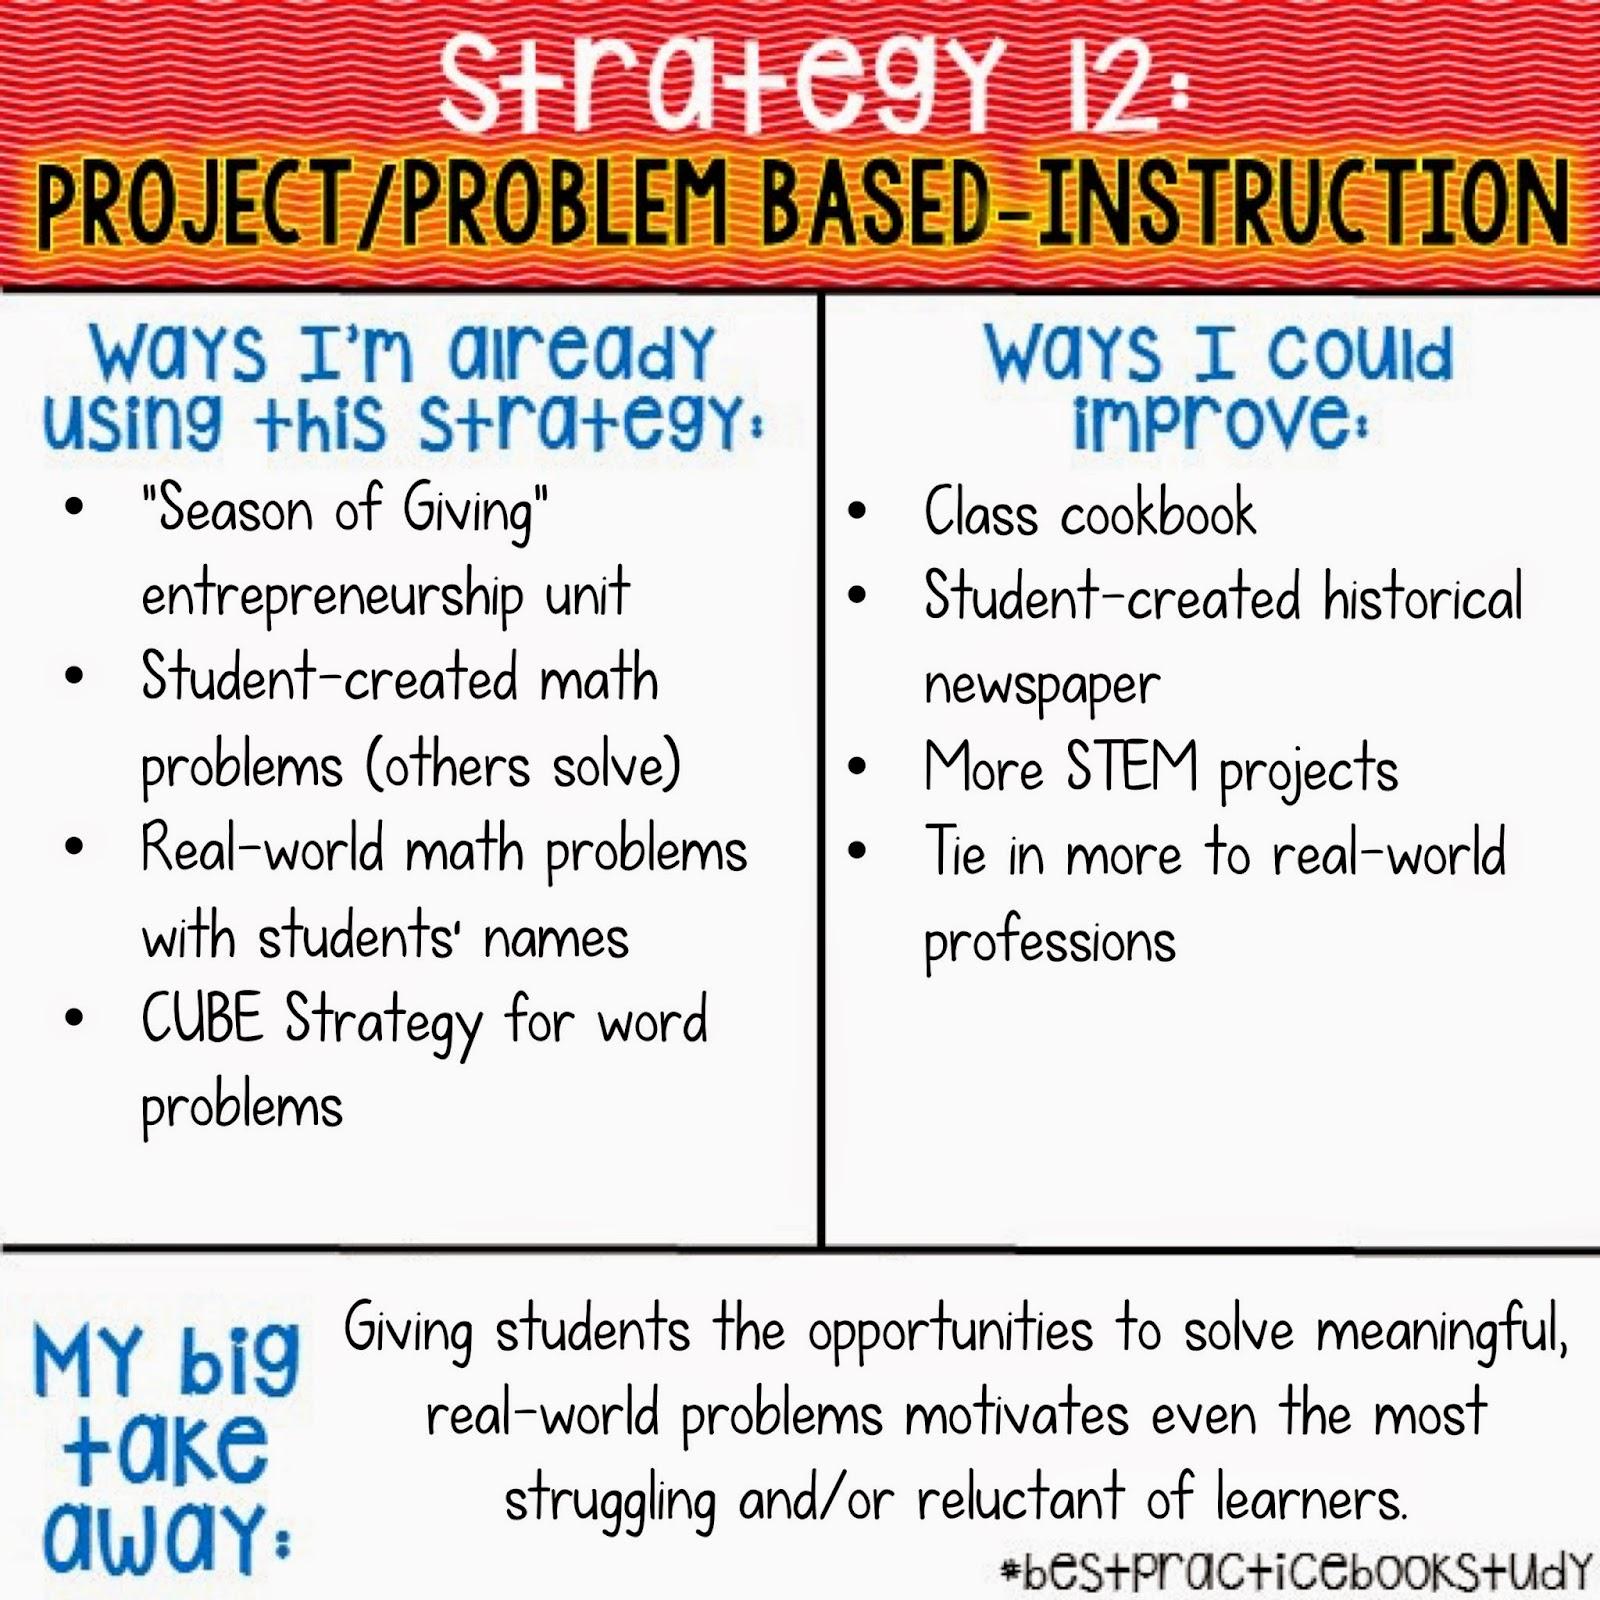 Worksheets Dont Grow Dendrites ProjectProblemBased Learning – Worksheets Don T Grow Dendrites